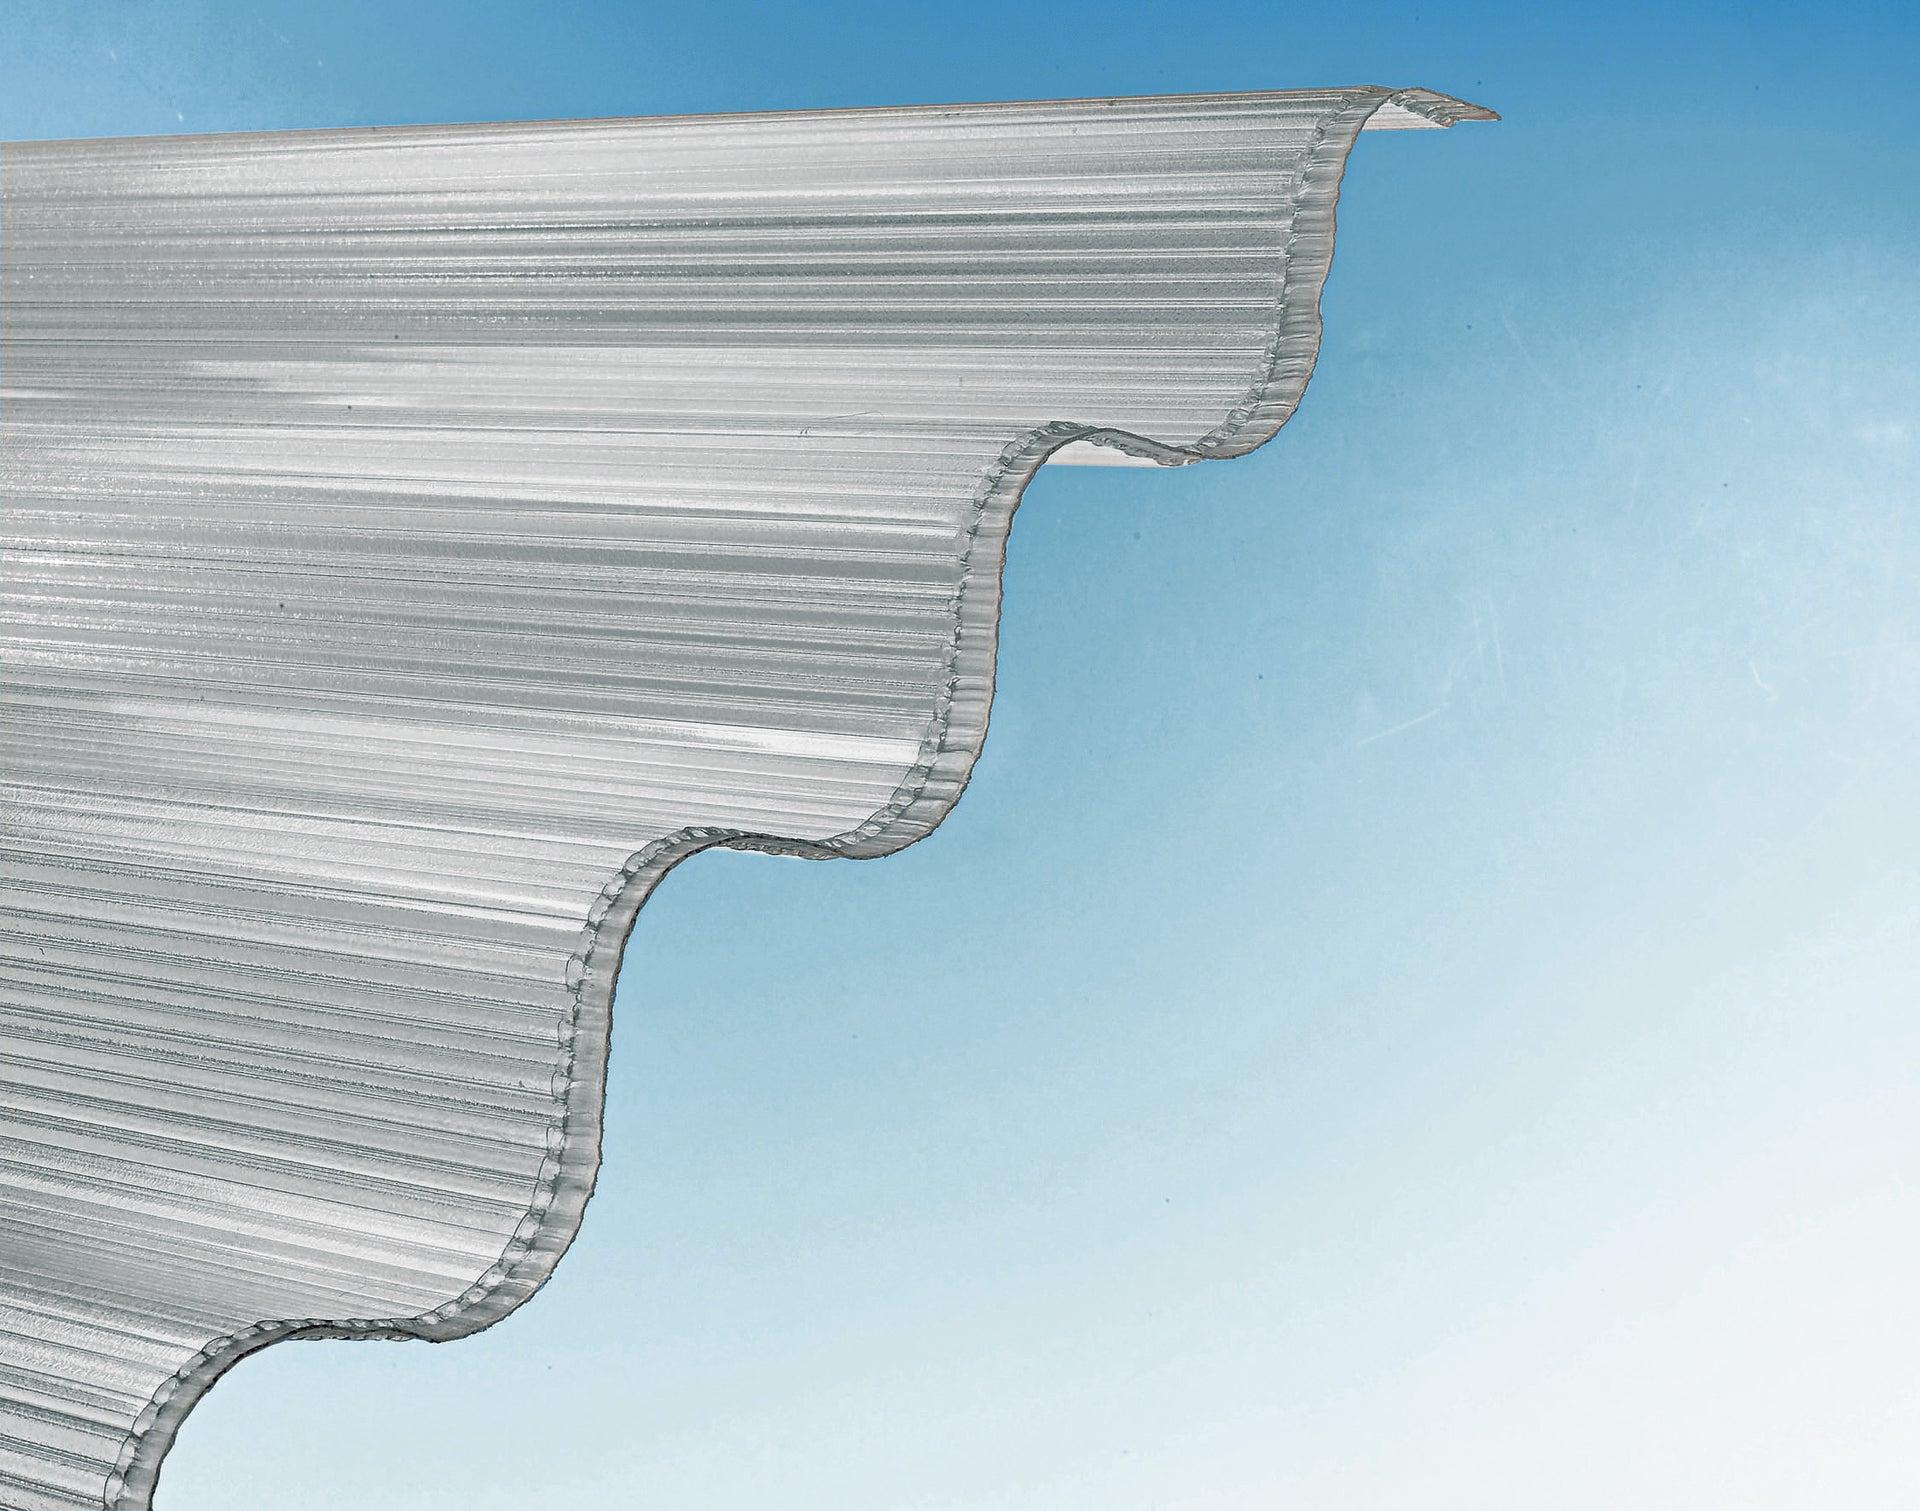 Plaque De Toiture Grande Onde Polycarbonate Translucide L 0 92 X L 2 M Leroy Merlin